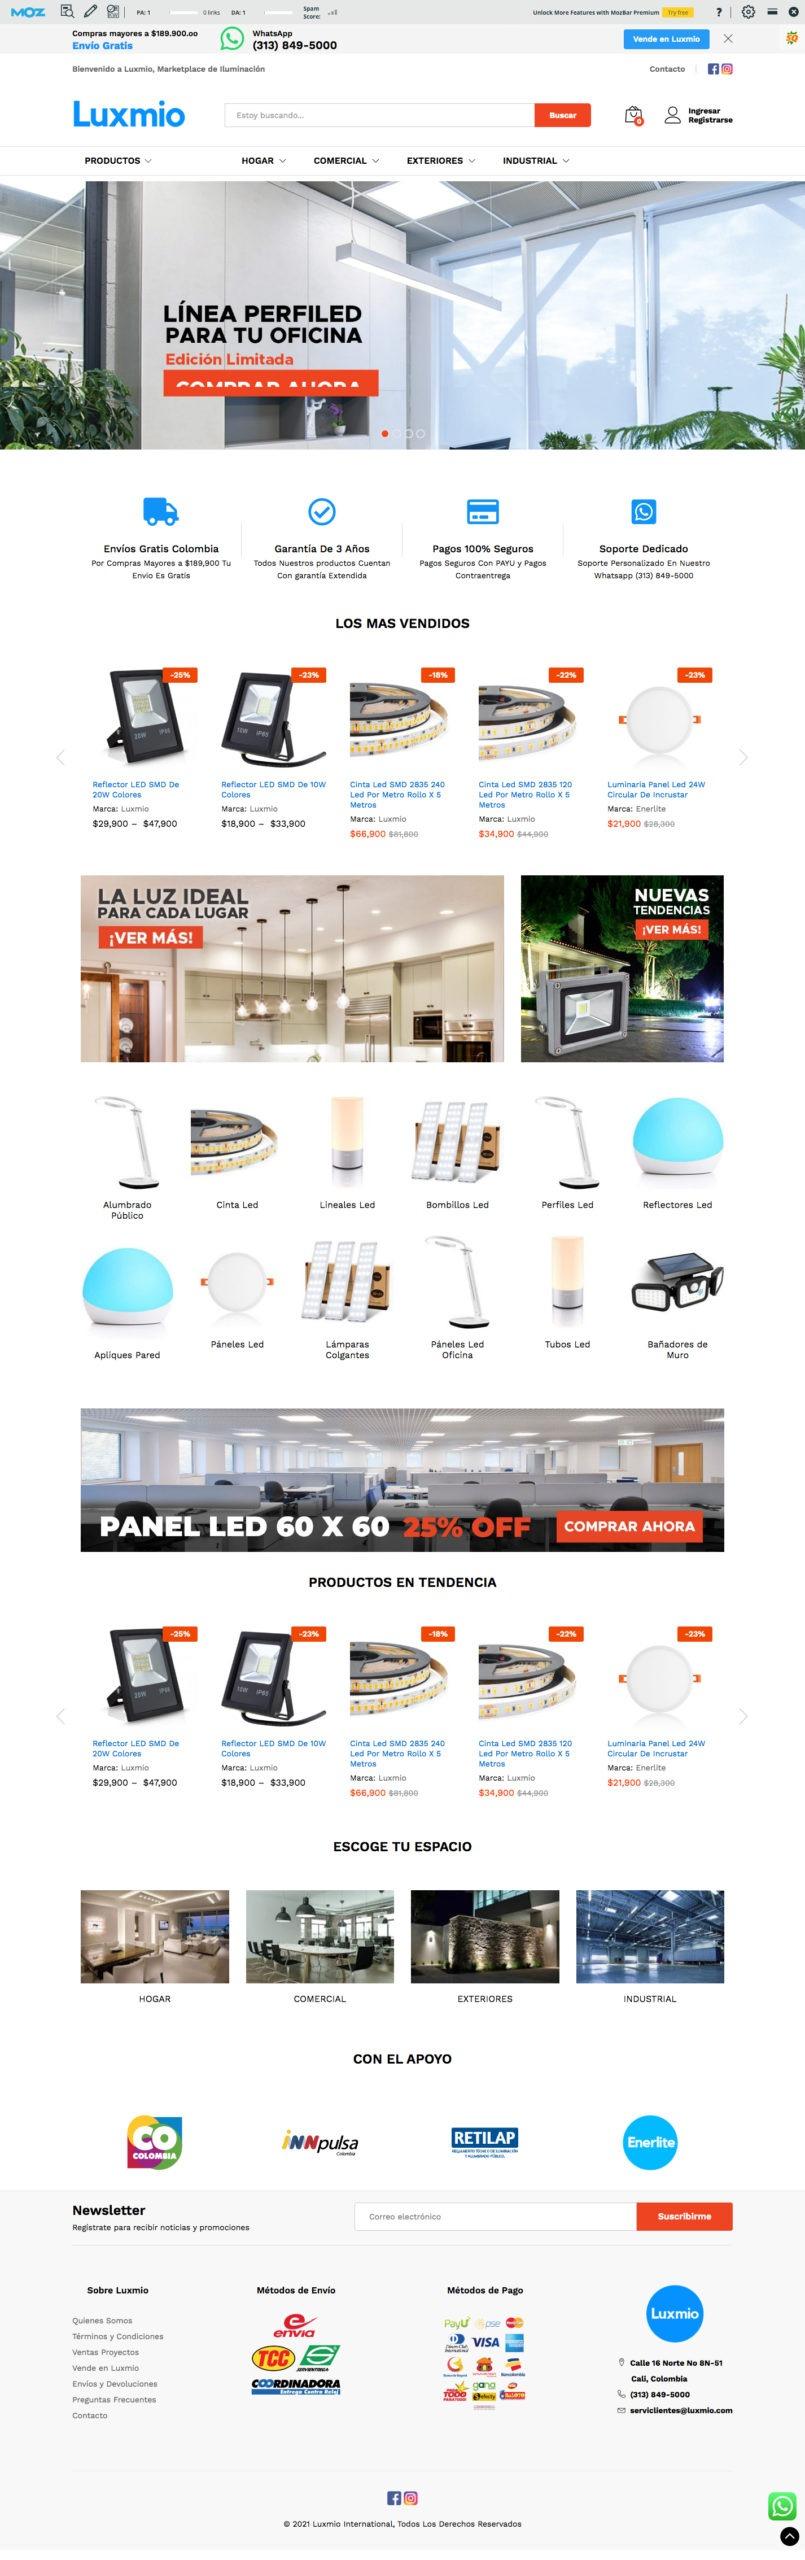 desarrollo market place luxmio iluminacion